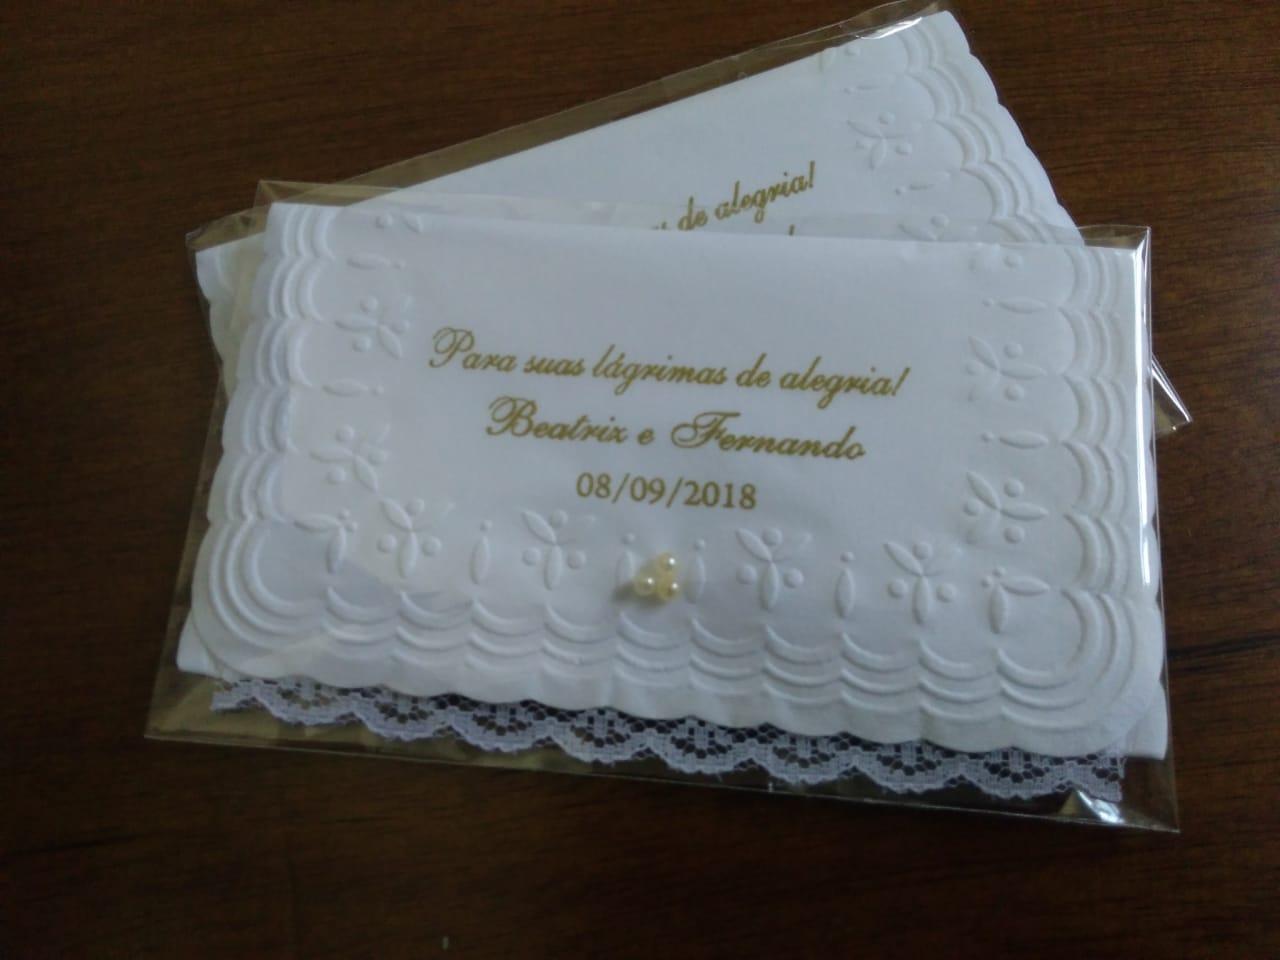 Lenço papel para lágrimas de alegria PERSONALIZADO - renda e pérola 50 unidades  - Persona Guardanapos & Cia